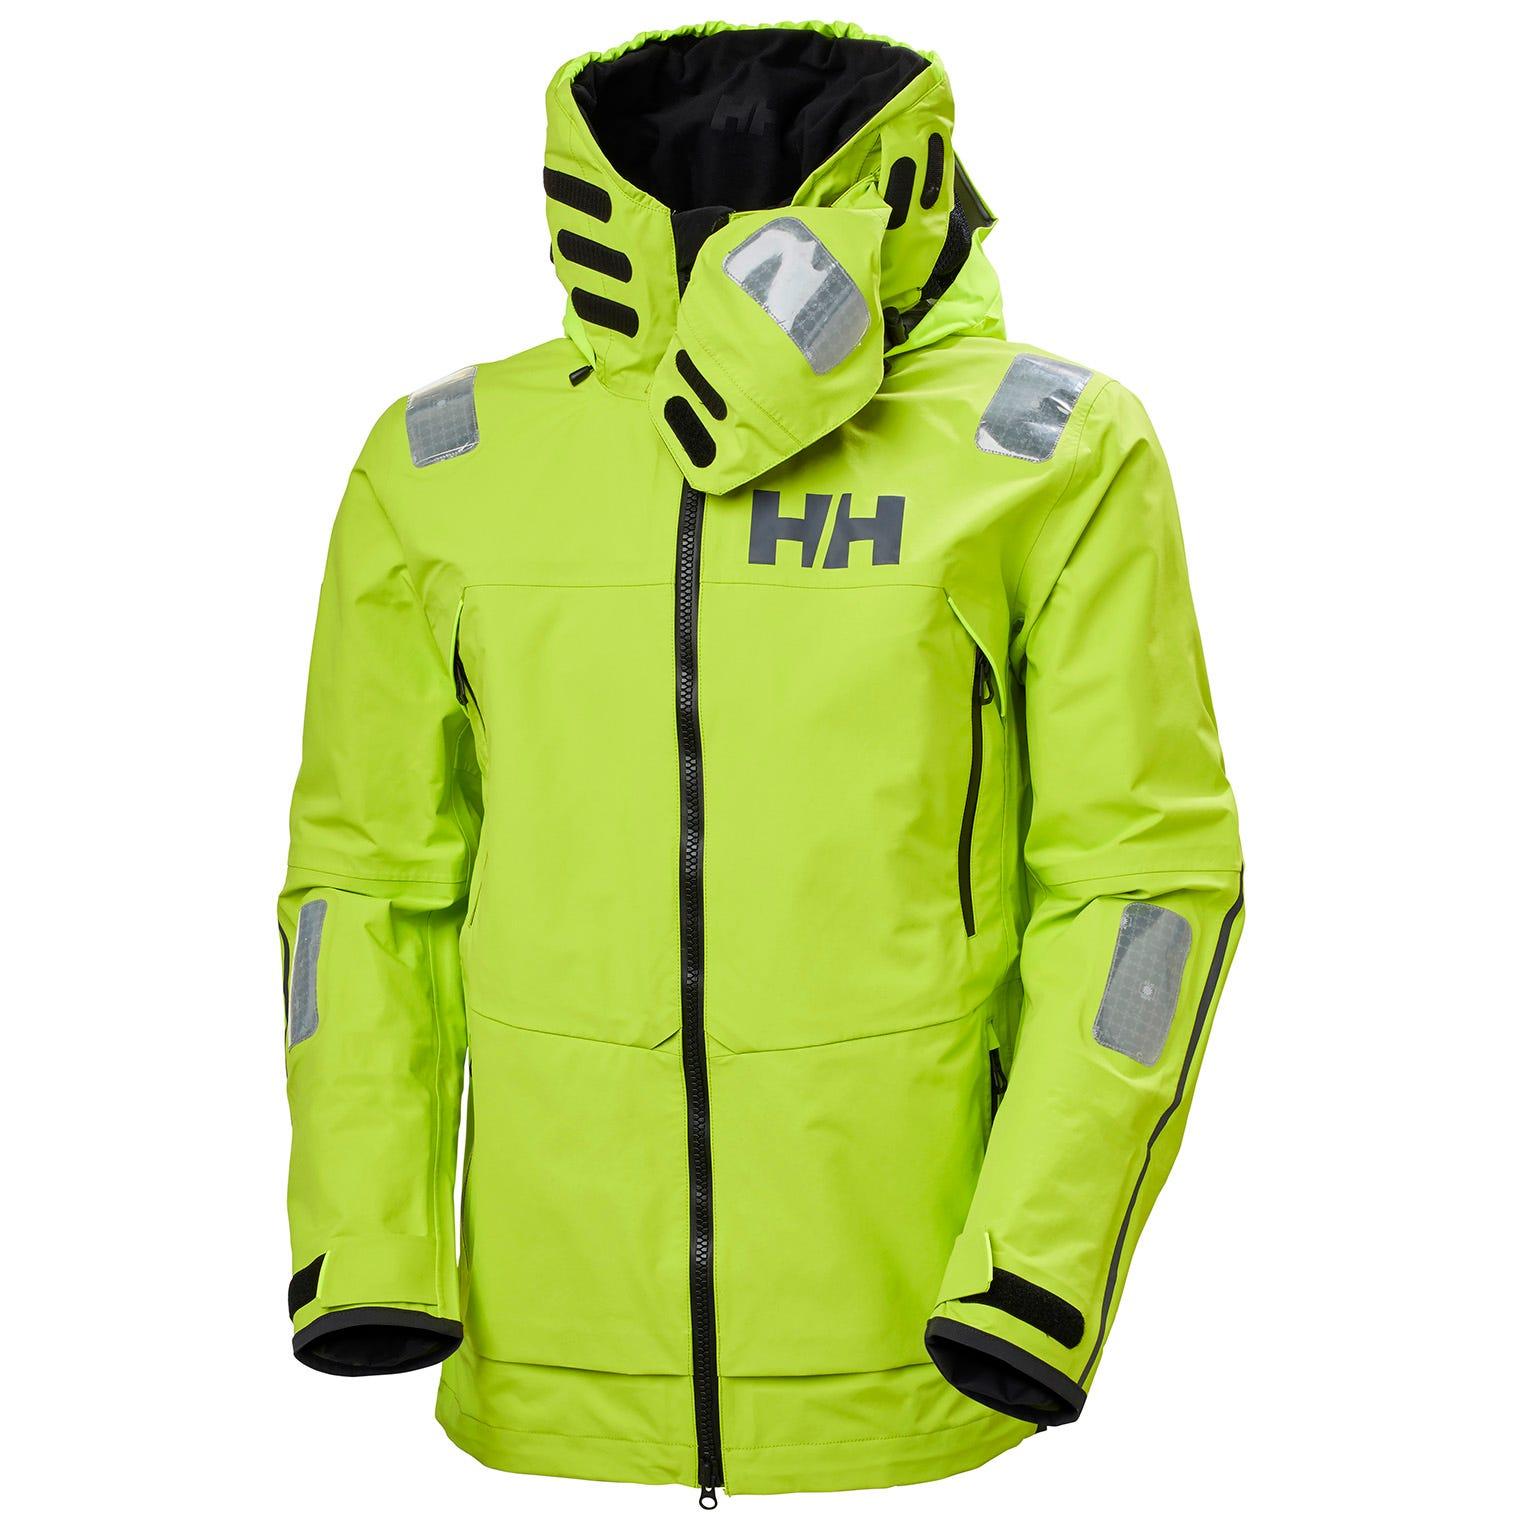 Helly Hansen Mens Aegir Race Sailing Jacket Green XXL